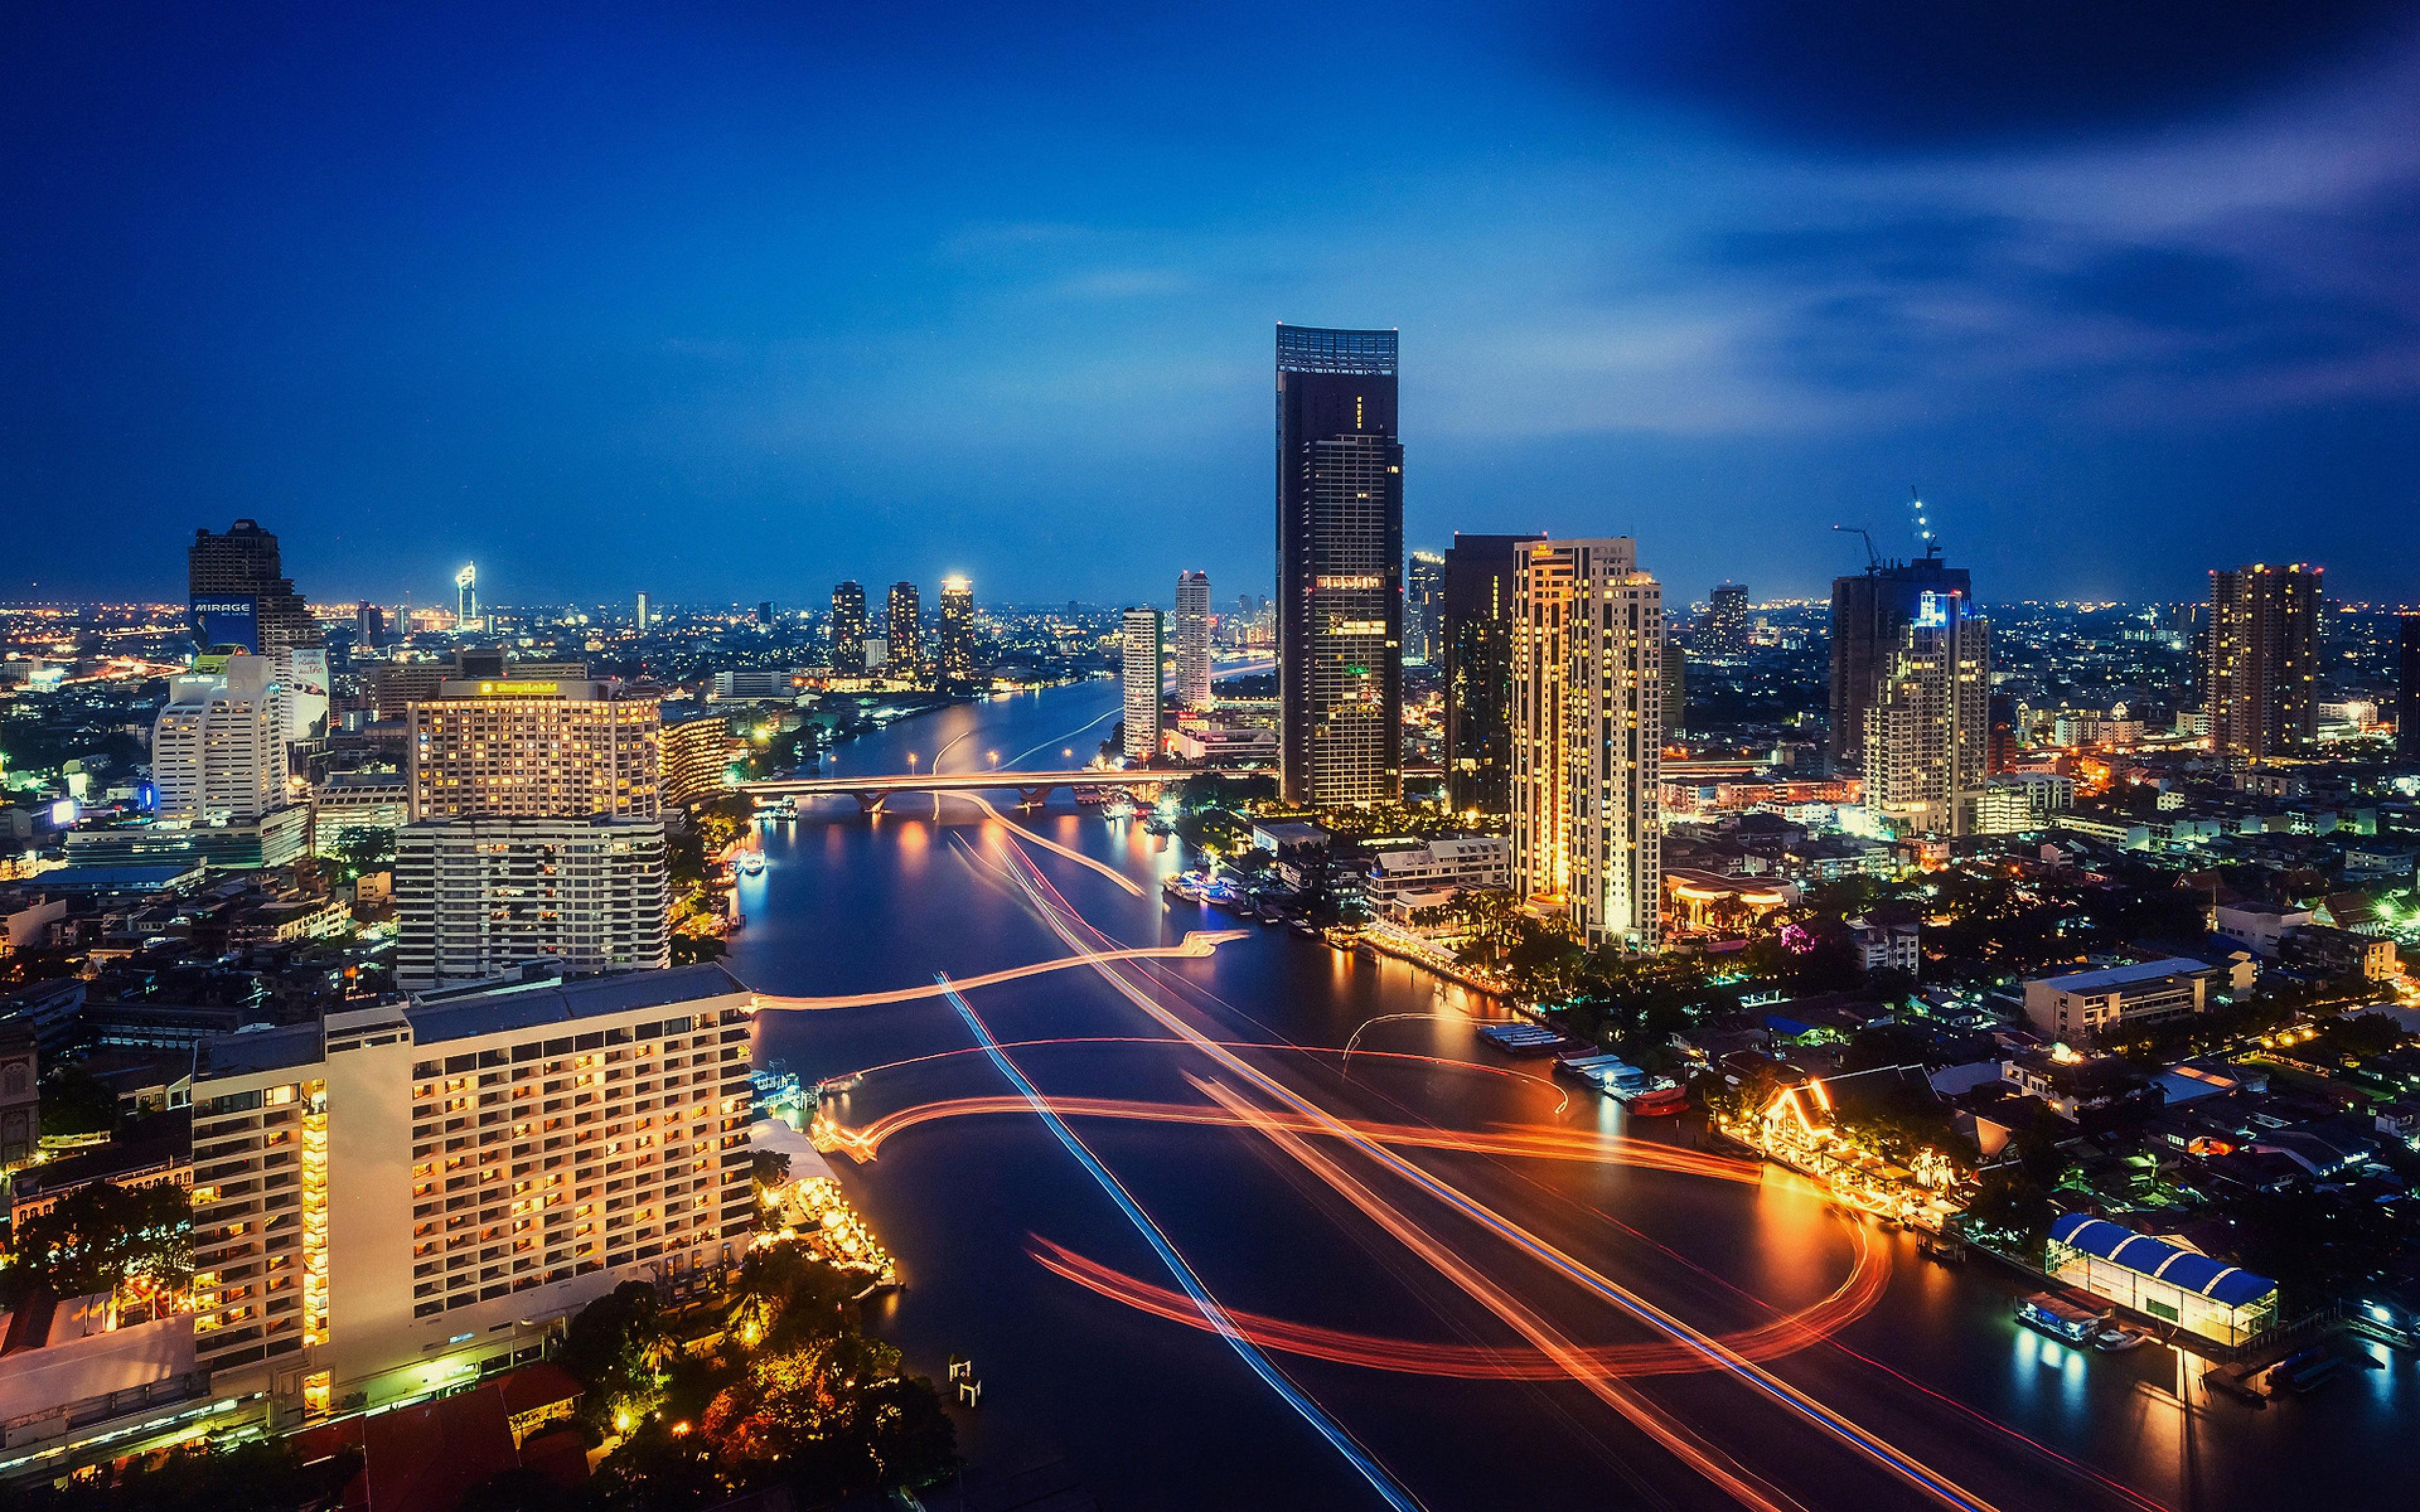 Night Lights Traffic HD Wallpaper Download Bangkok Thailand Night 3840x2400